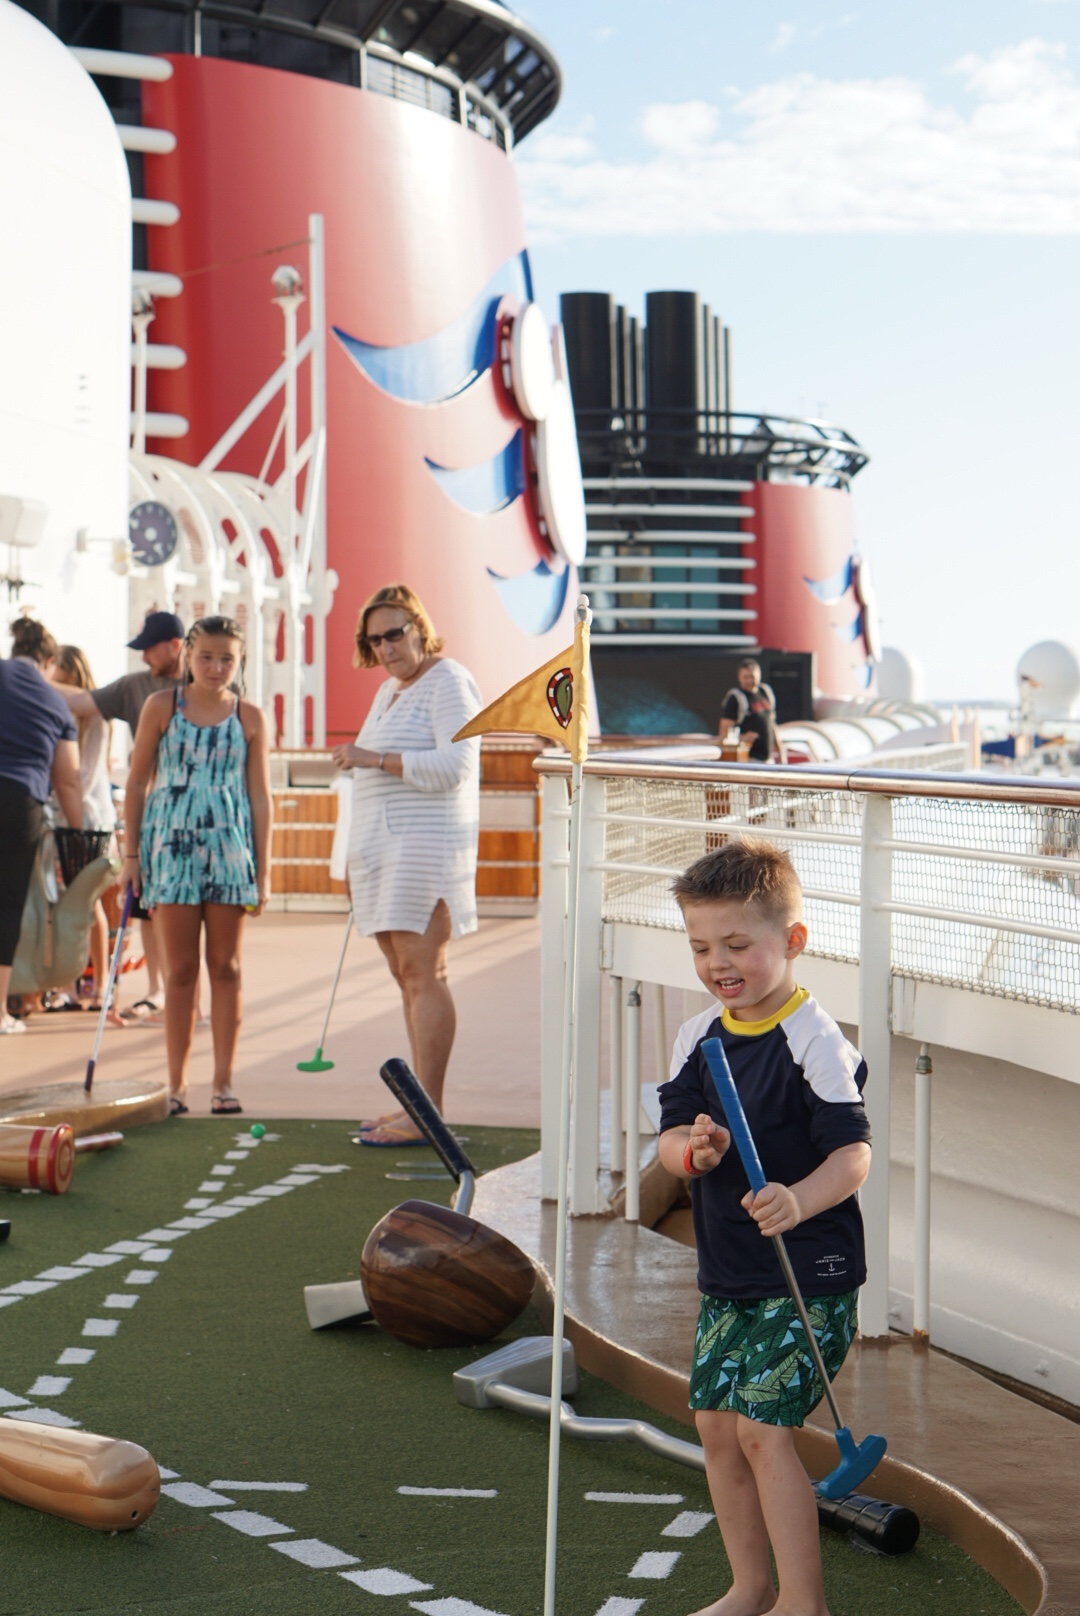 Disney Dream Cruise Ship Activities - DisneySMMC Disney Social Media Moms Celebration 2018 via Misty Nelson #disneysmmc #disneymoms